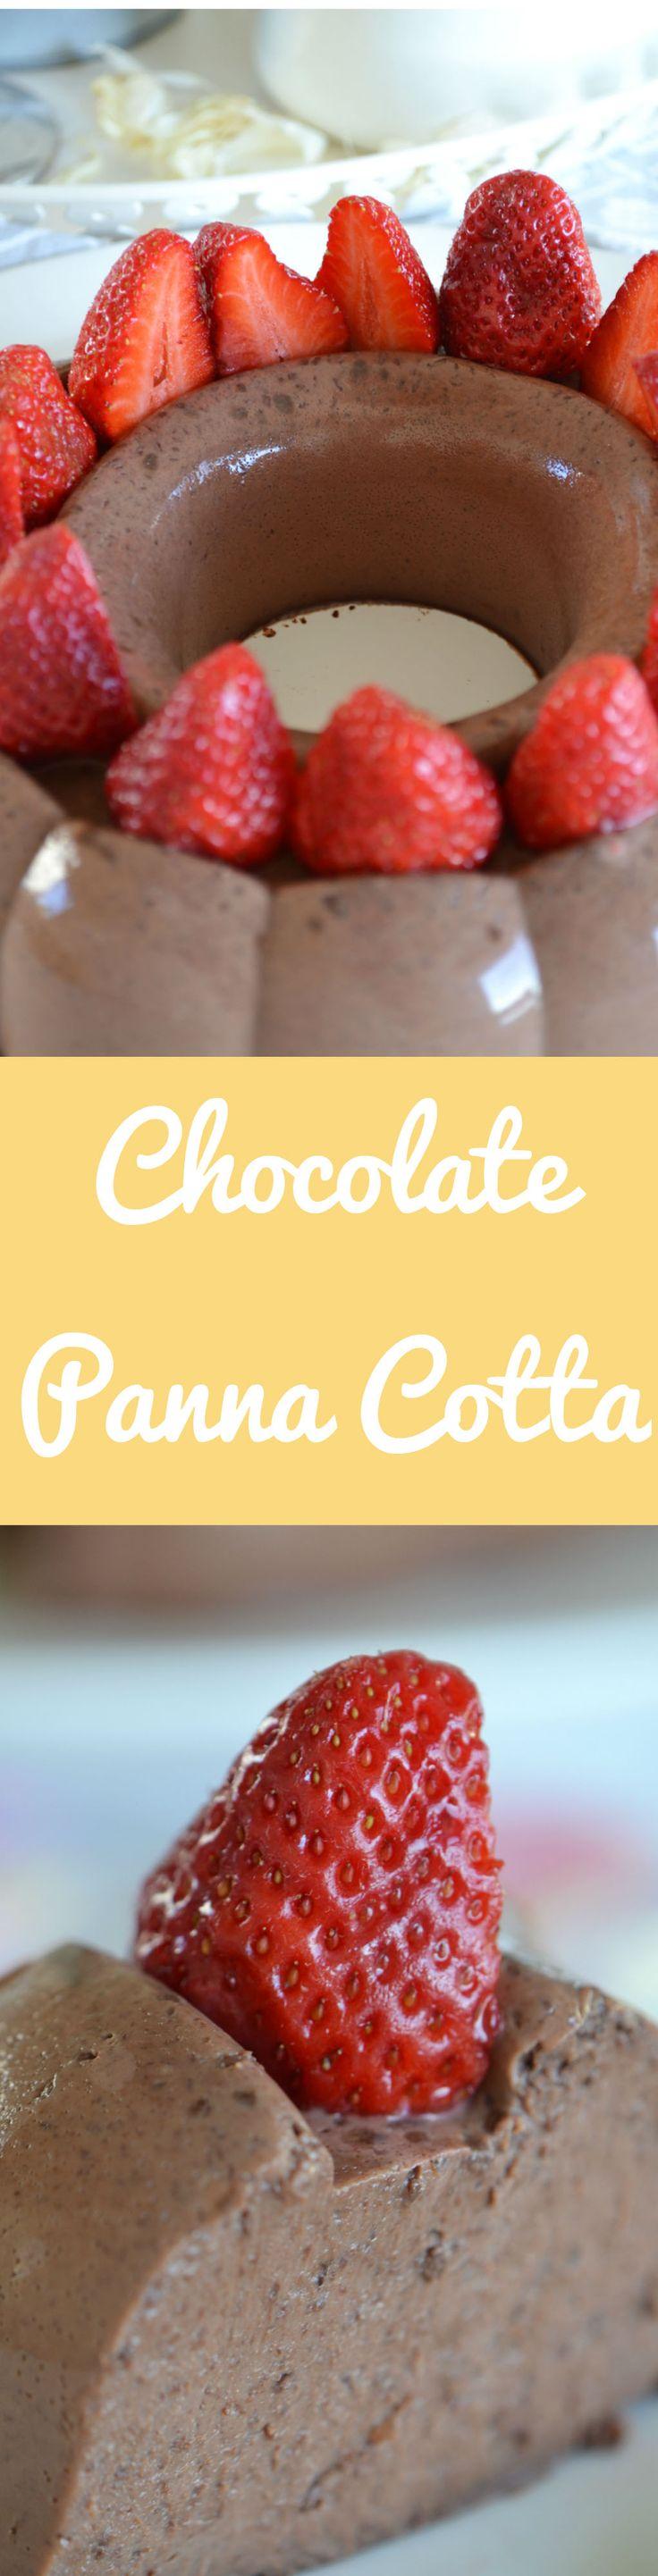 Rich Flavored Chocolate Panna Cotta